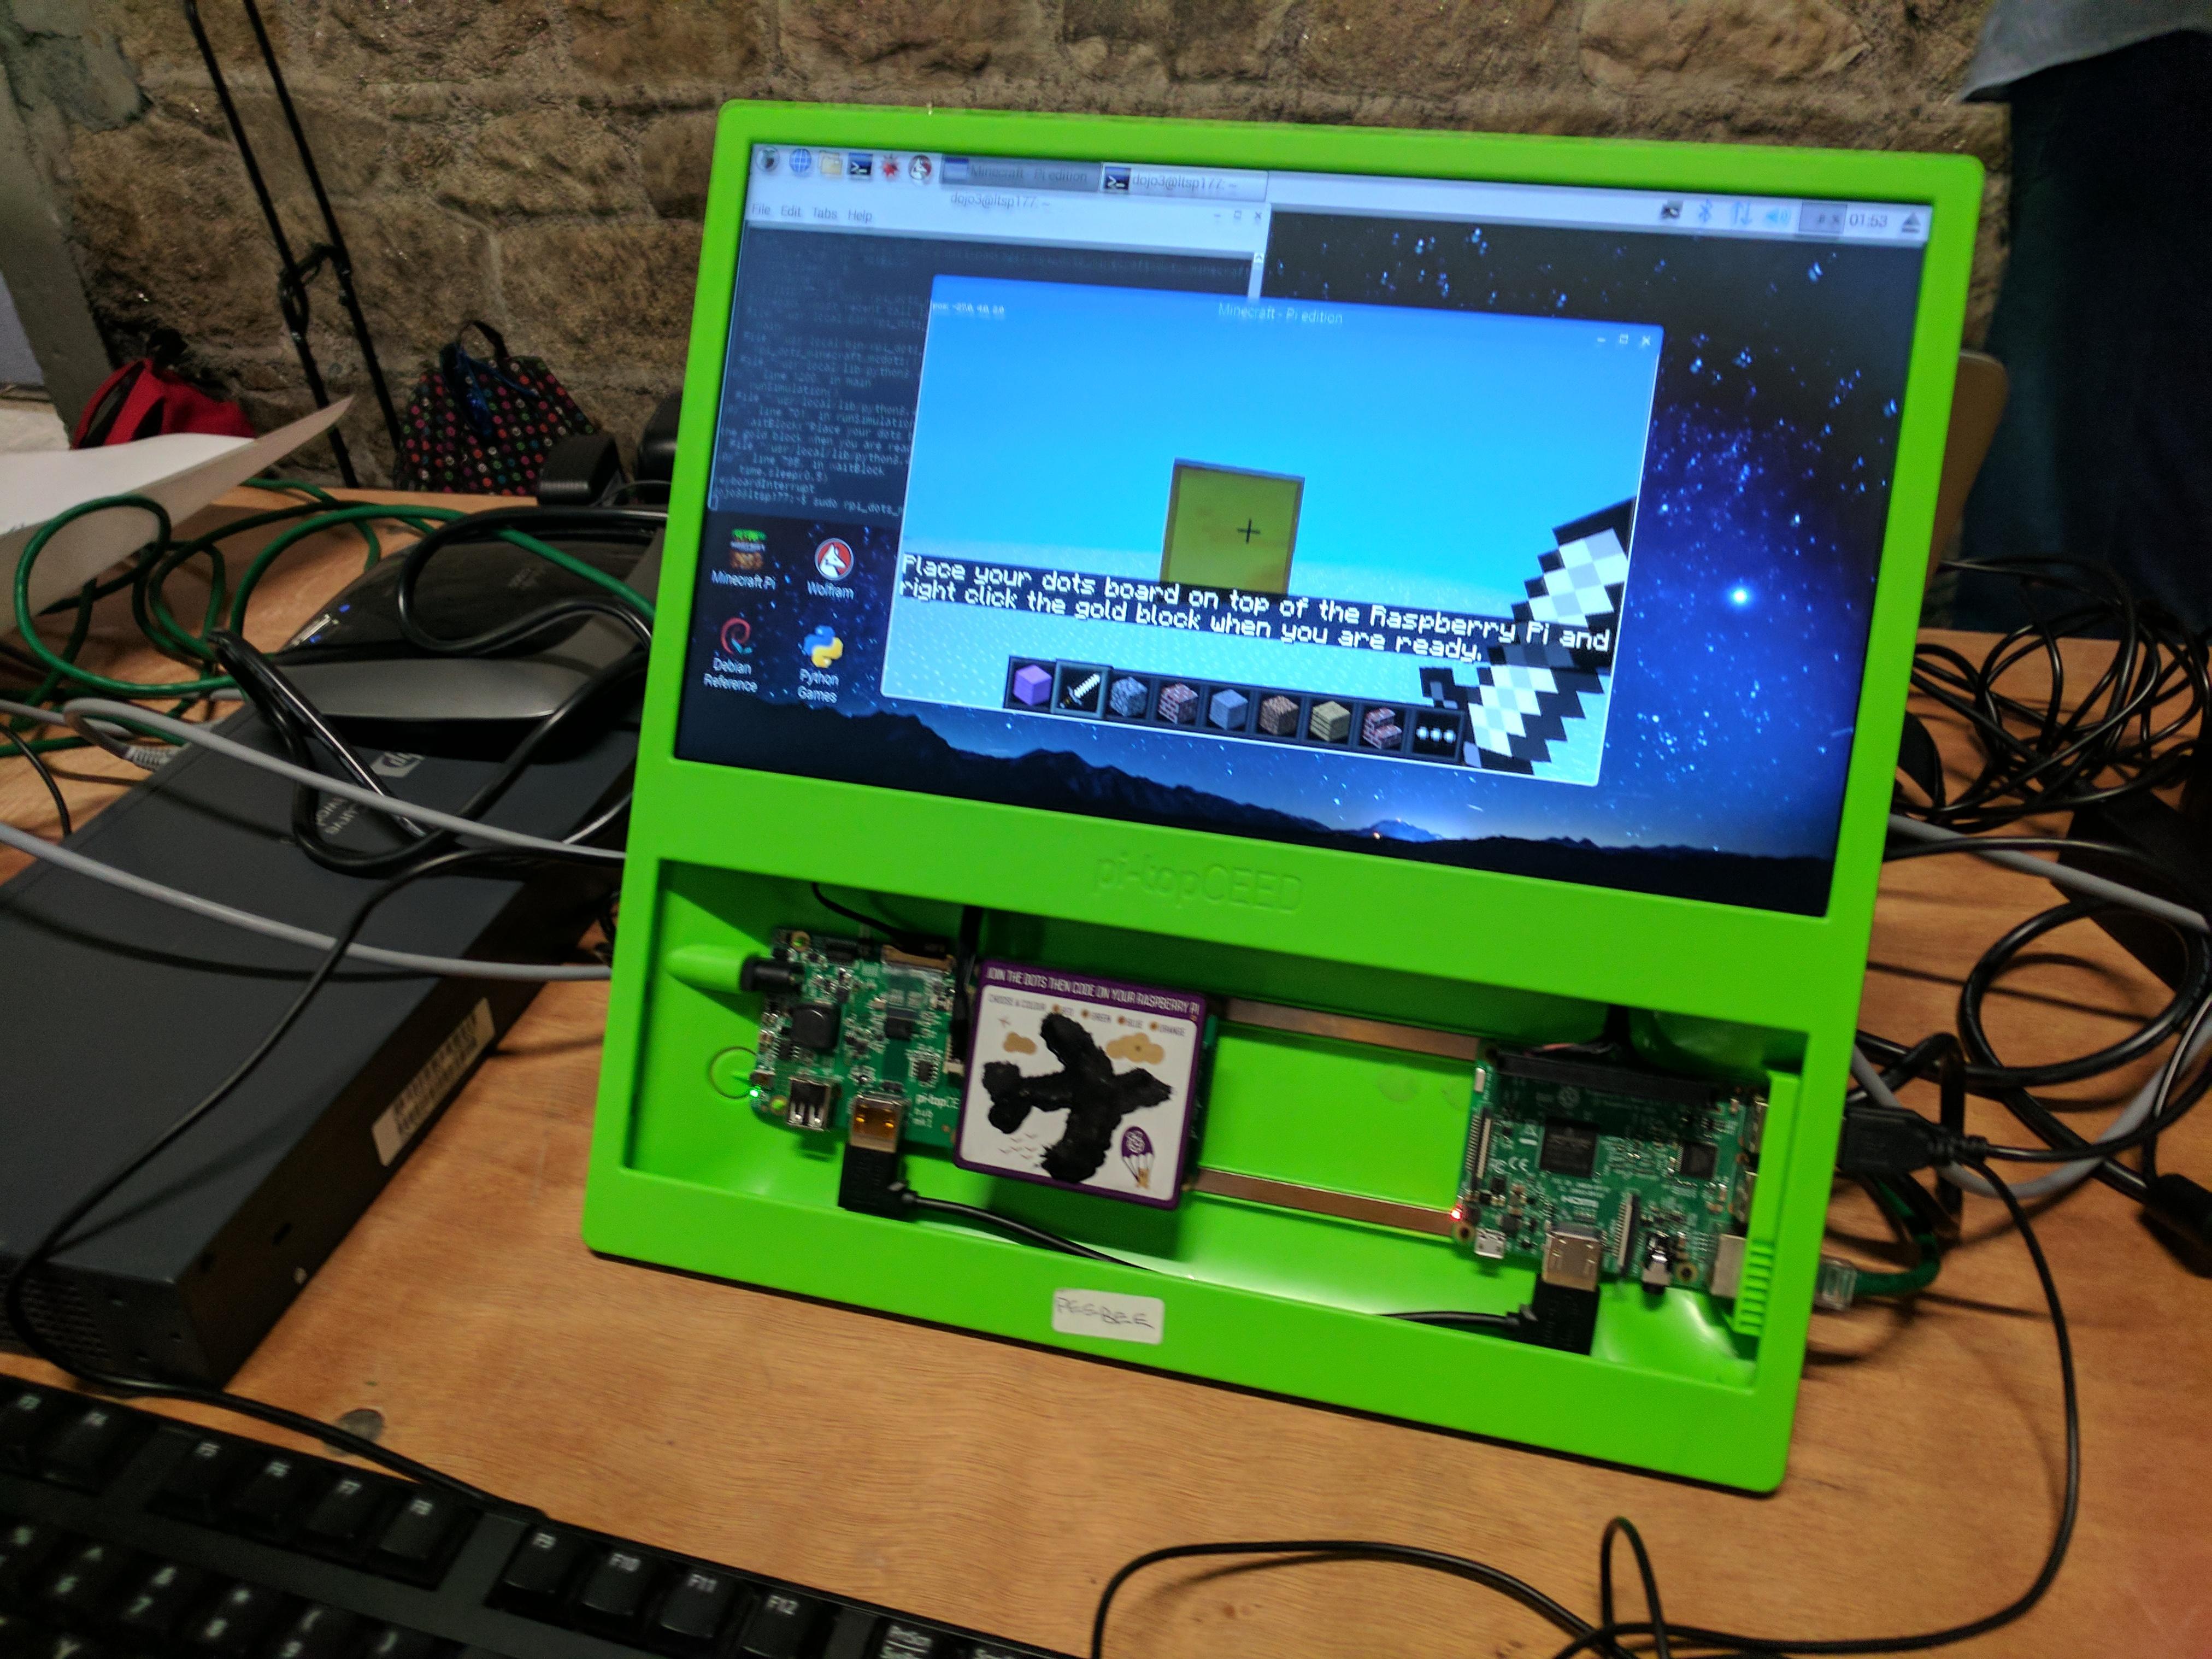 CoderDojo Coolest Projects 2017 - Raspberry Pi